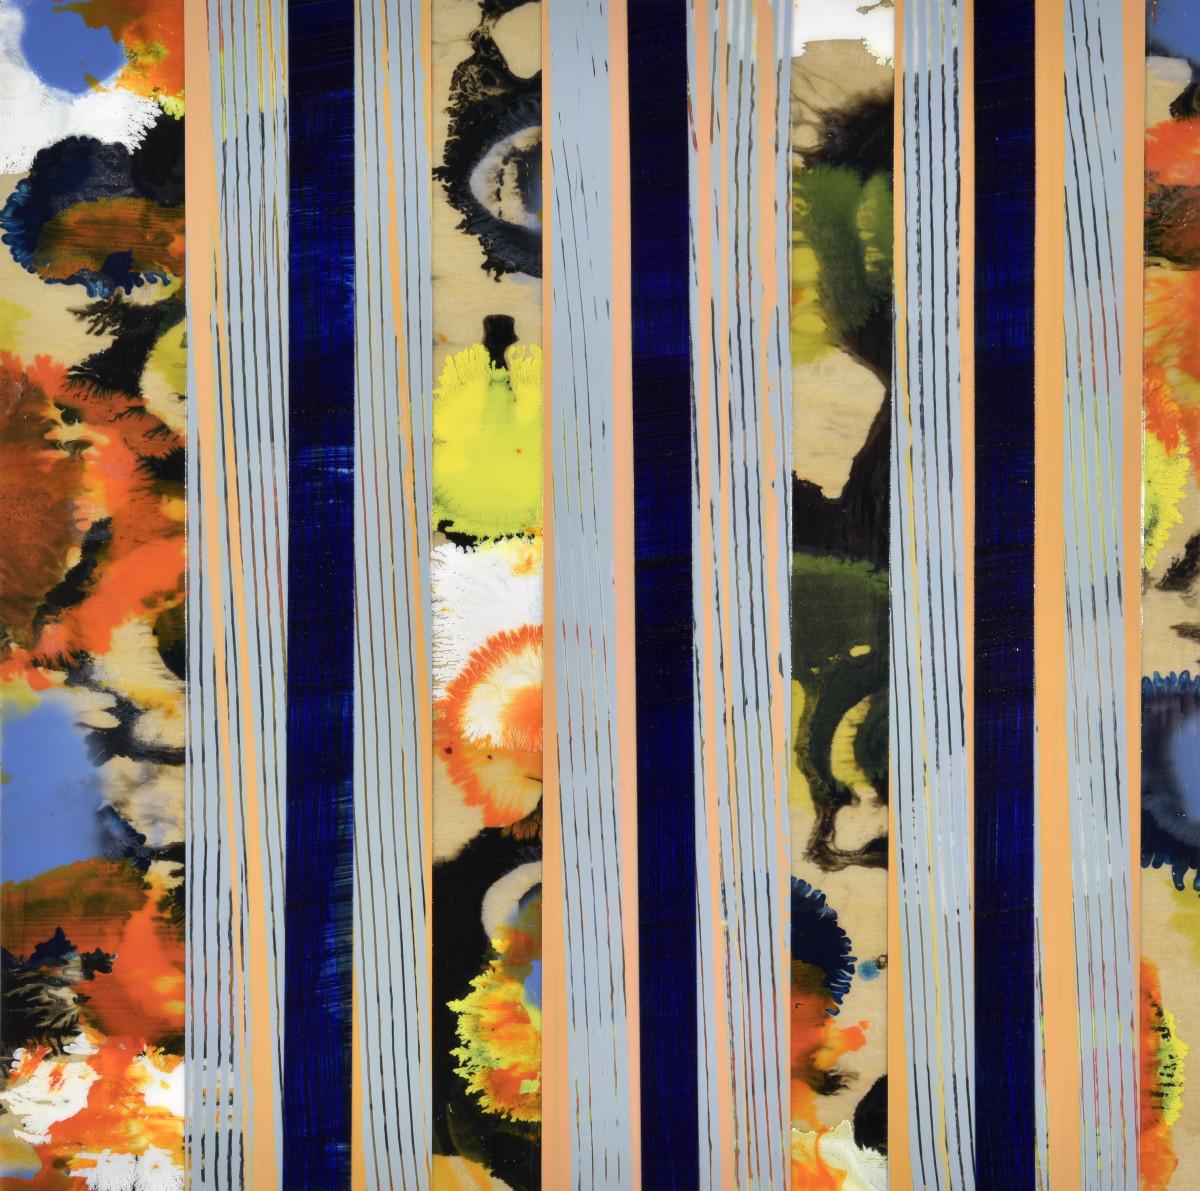 107/100 by Mary Zeran